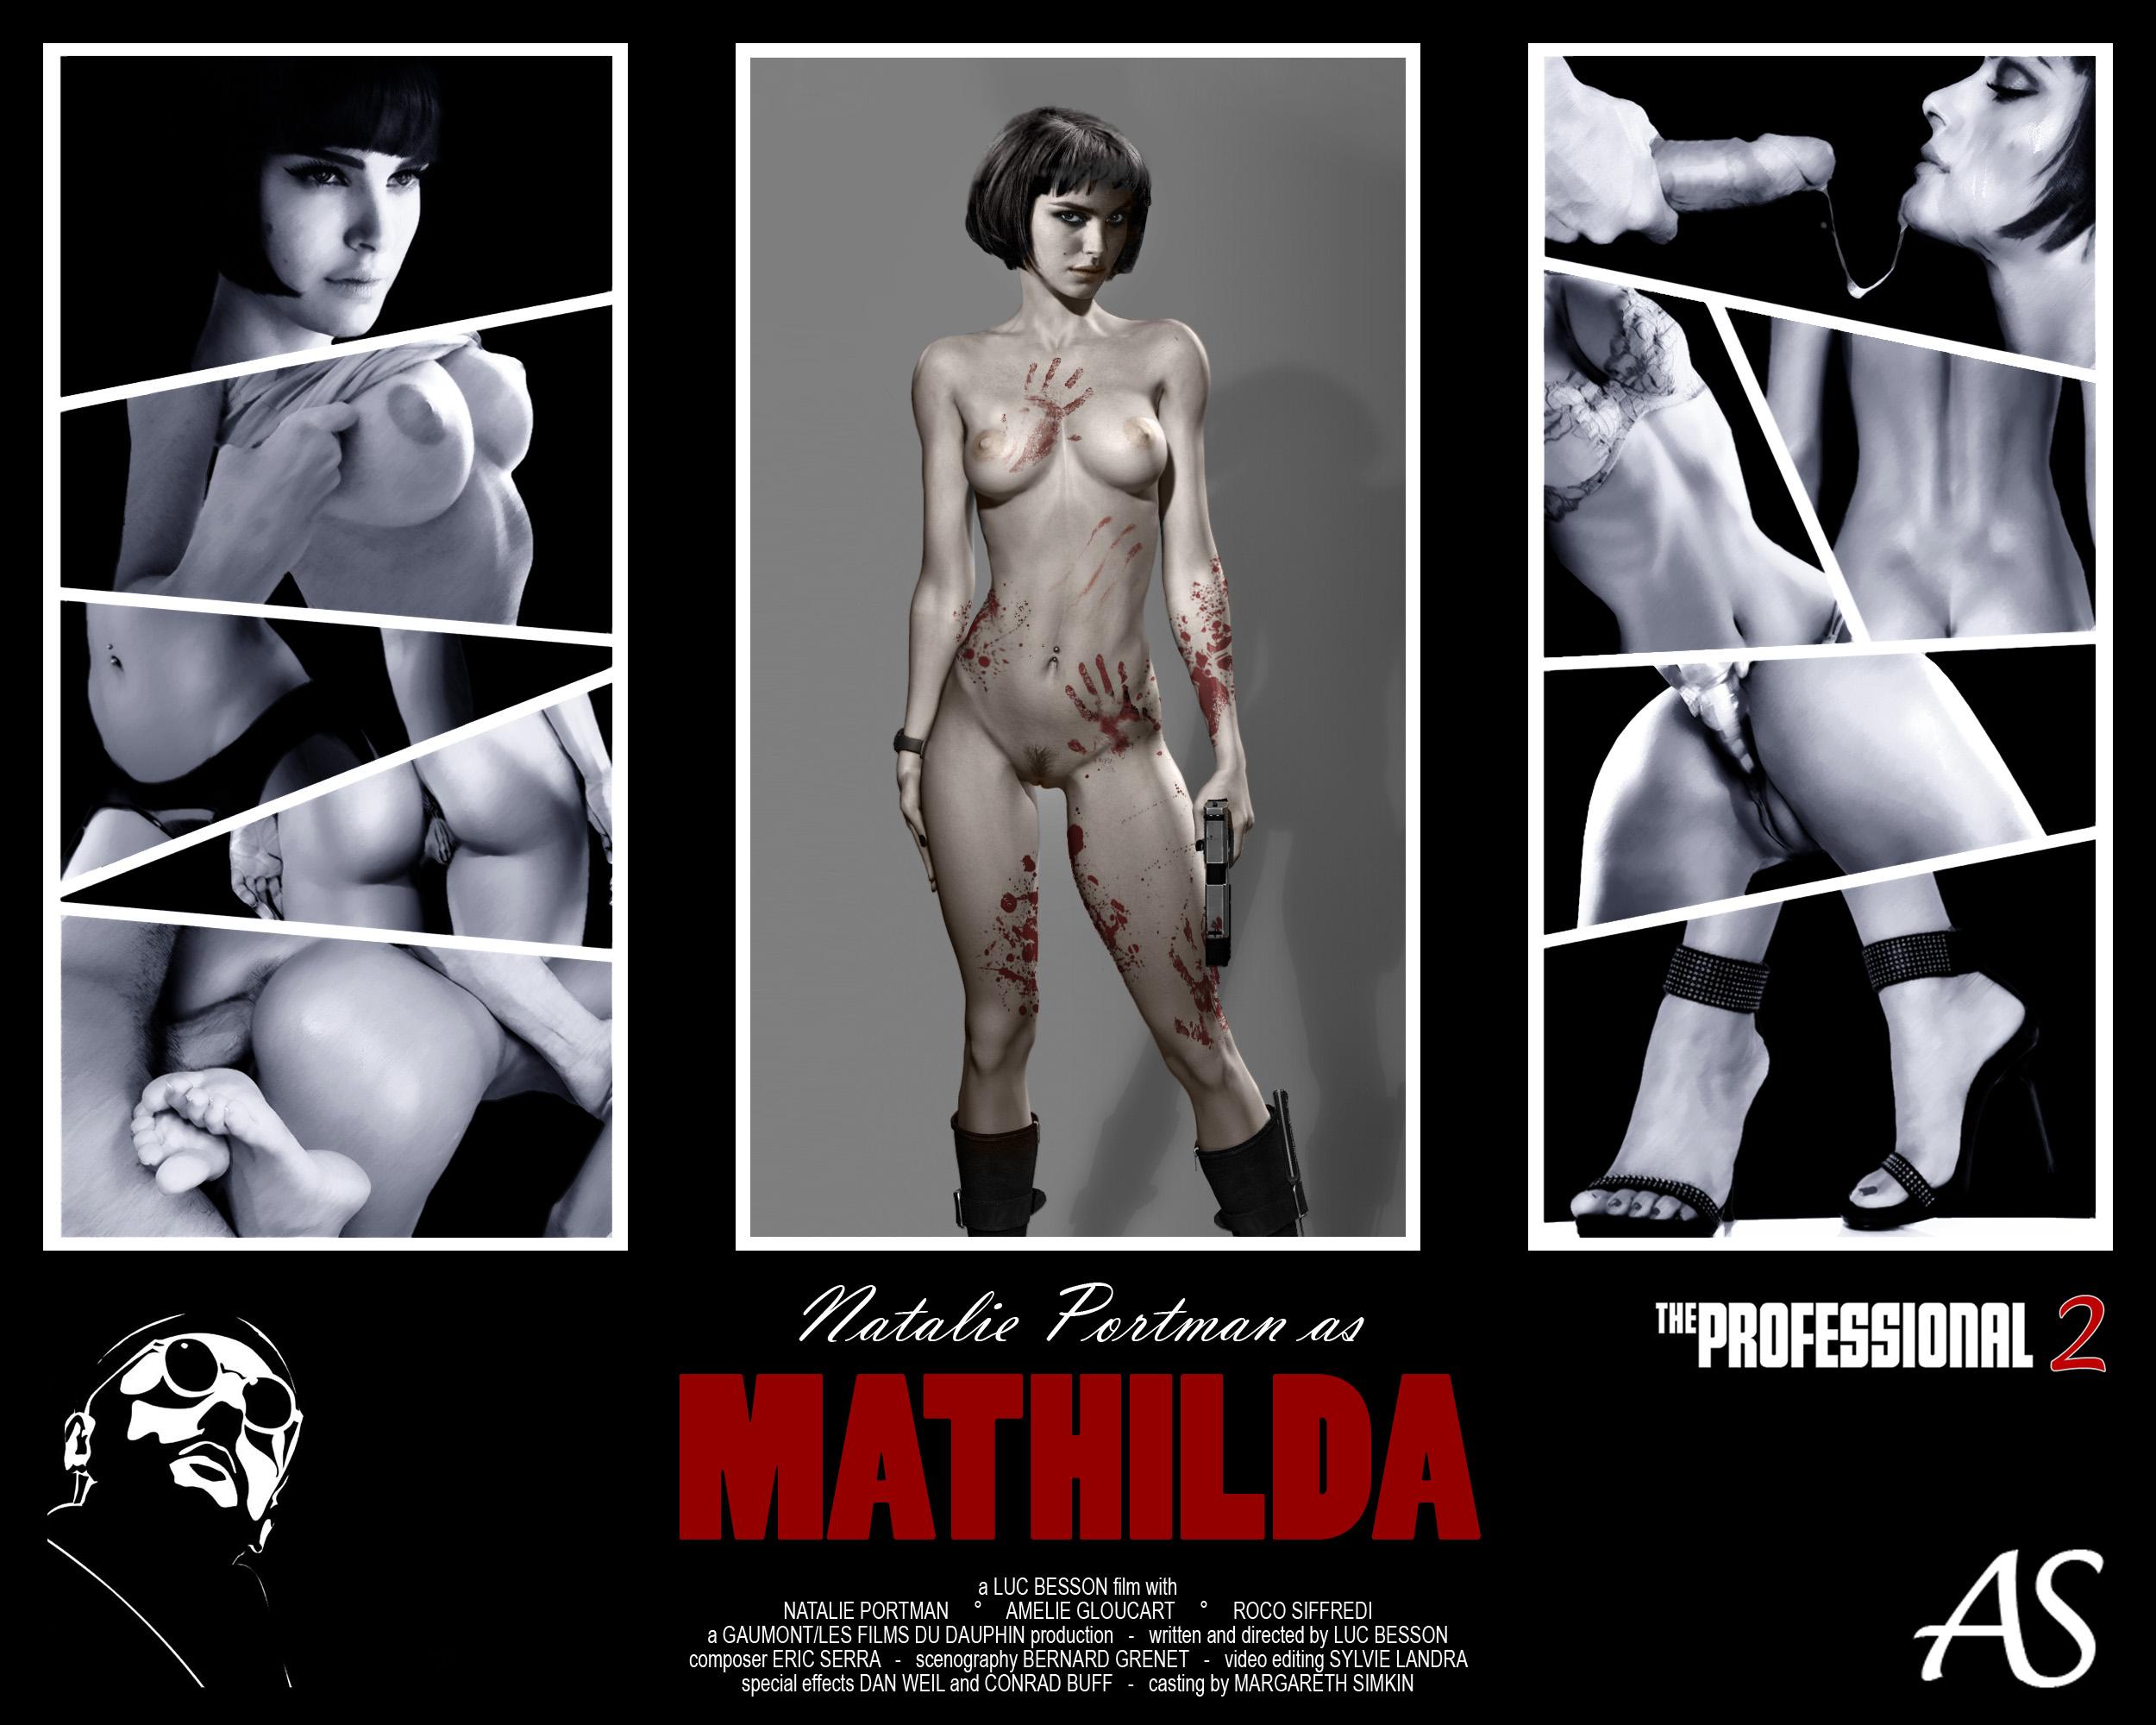 Natalie portman nude photos naked sex pics